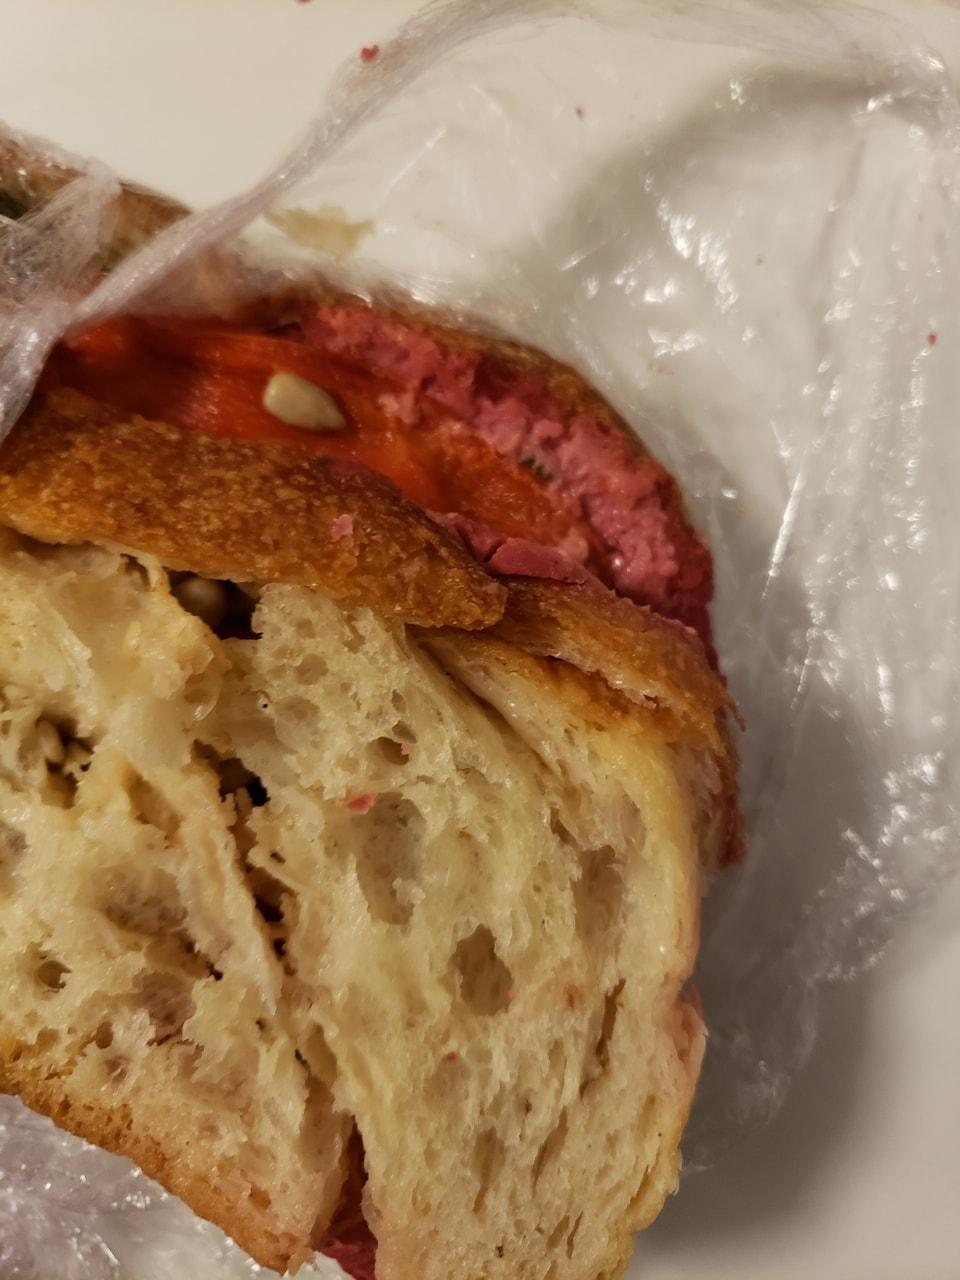 Fresh vegan sandwich (Rodbethummus) from caffe Nero (25/08)